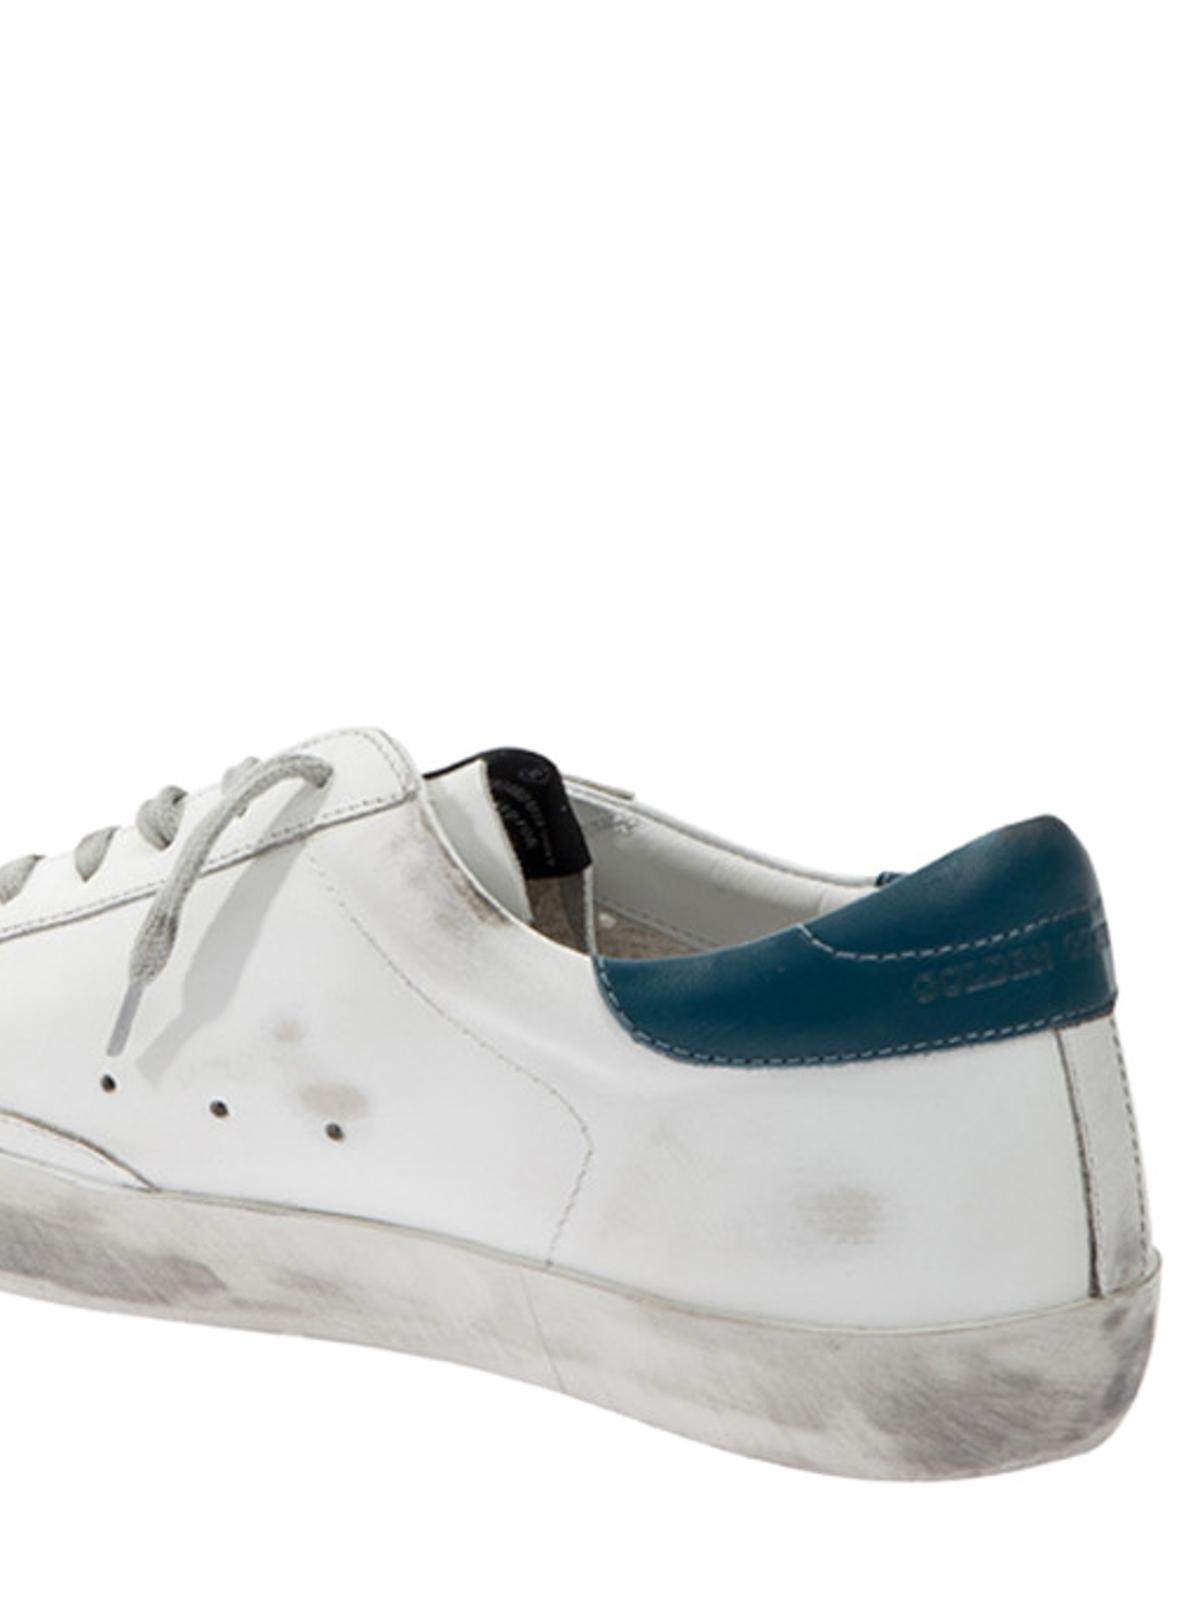 Golden Goose Sneaker in pelle effetto usato sneakers